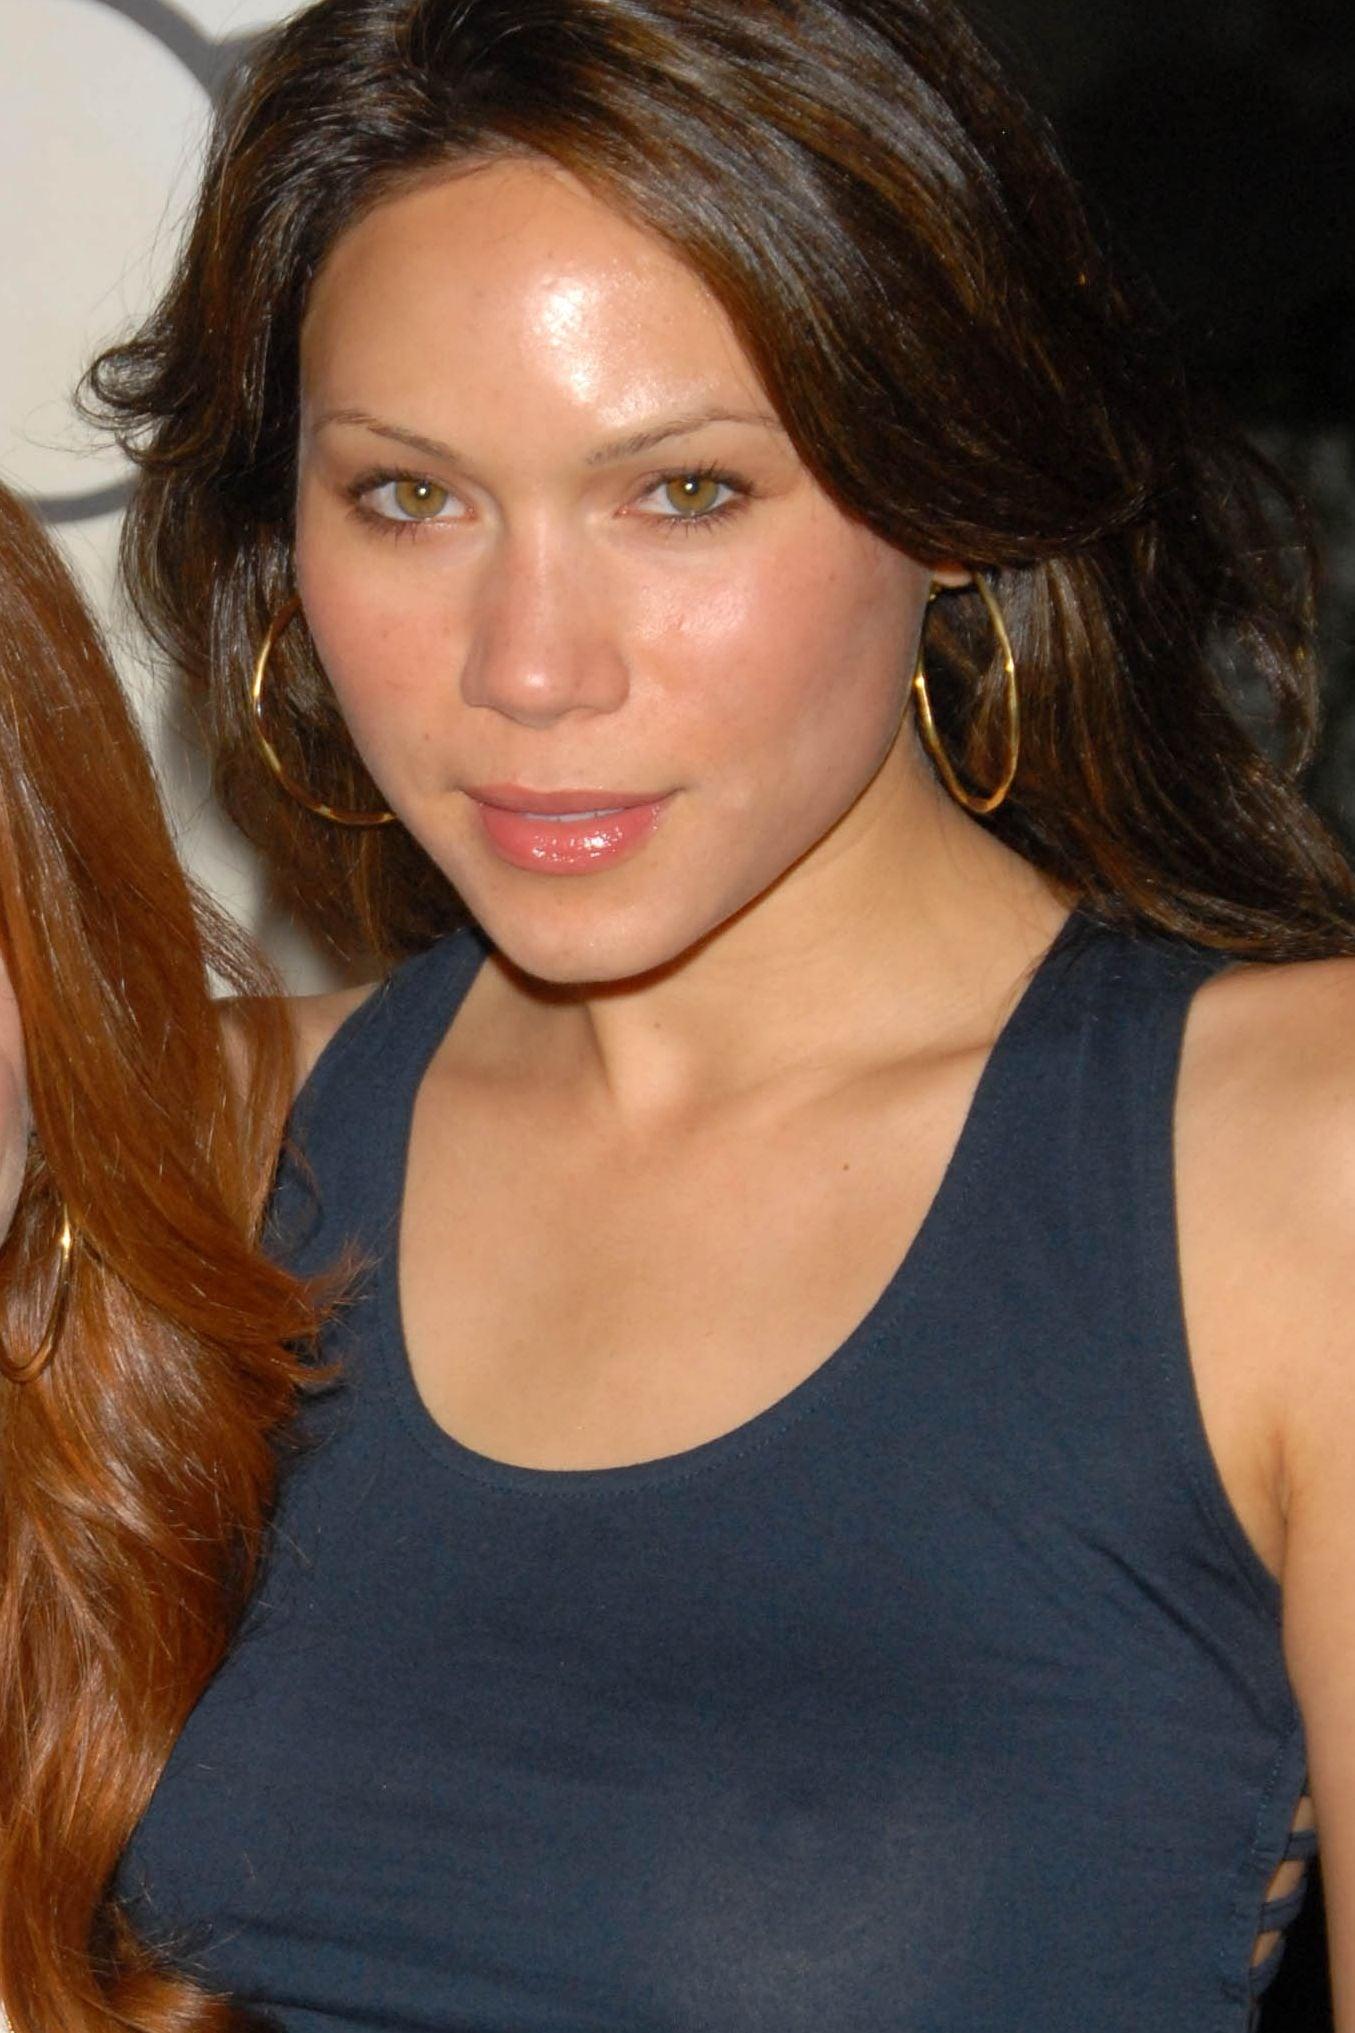 Jennifer Roa